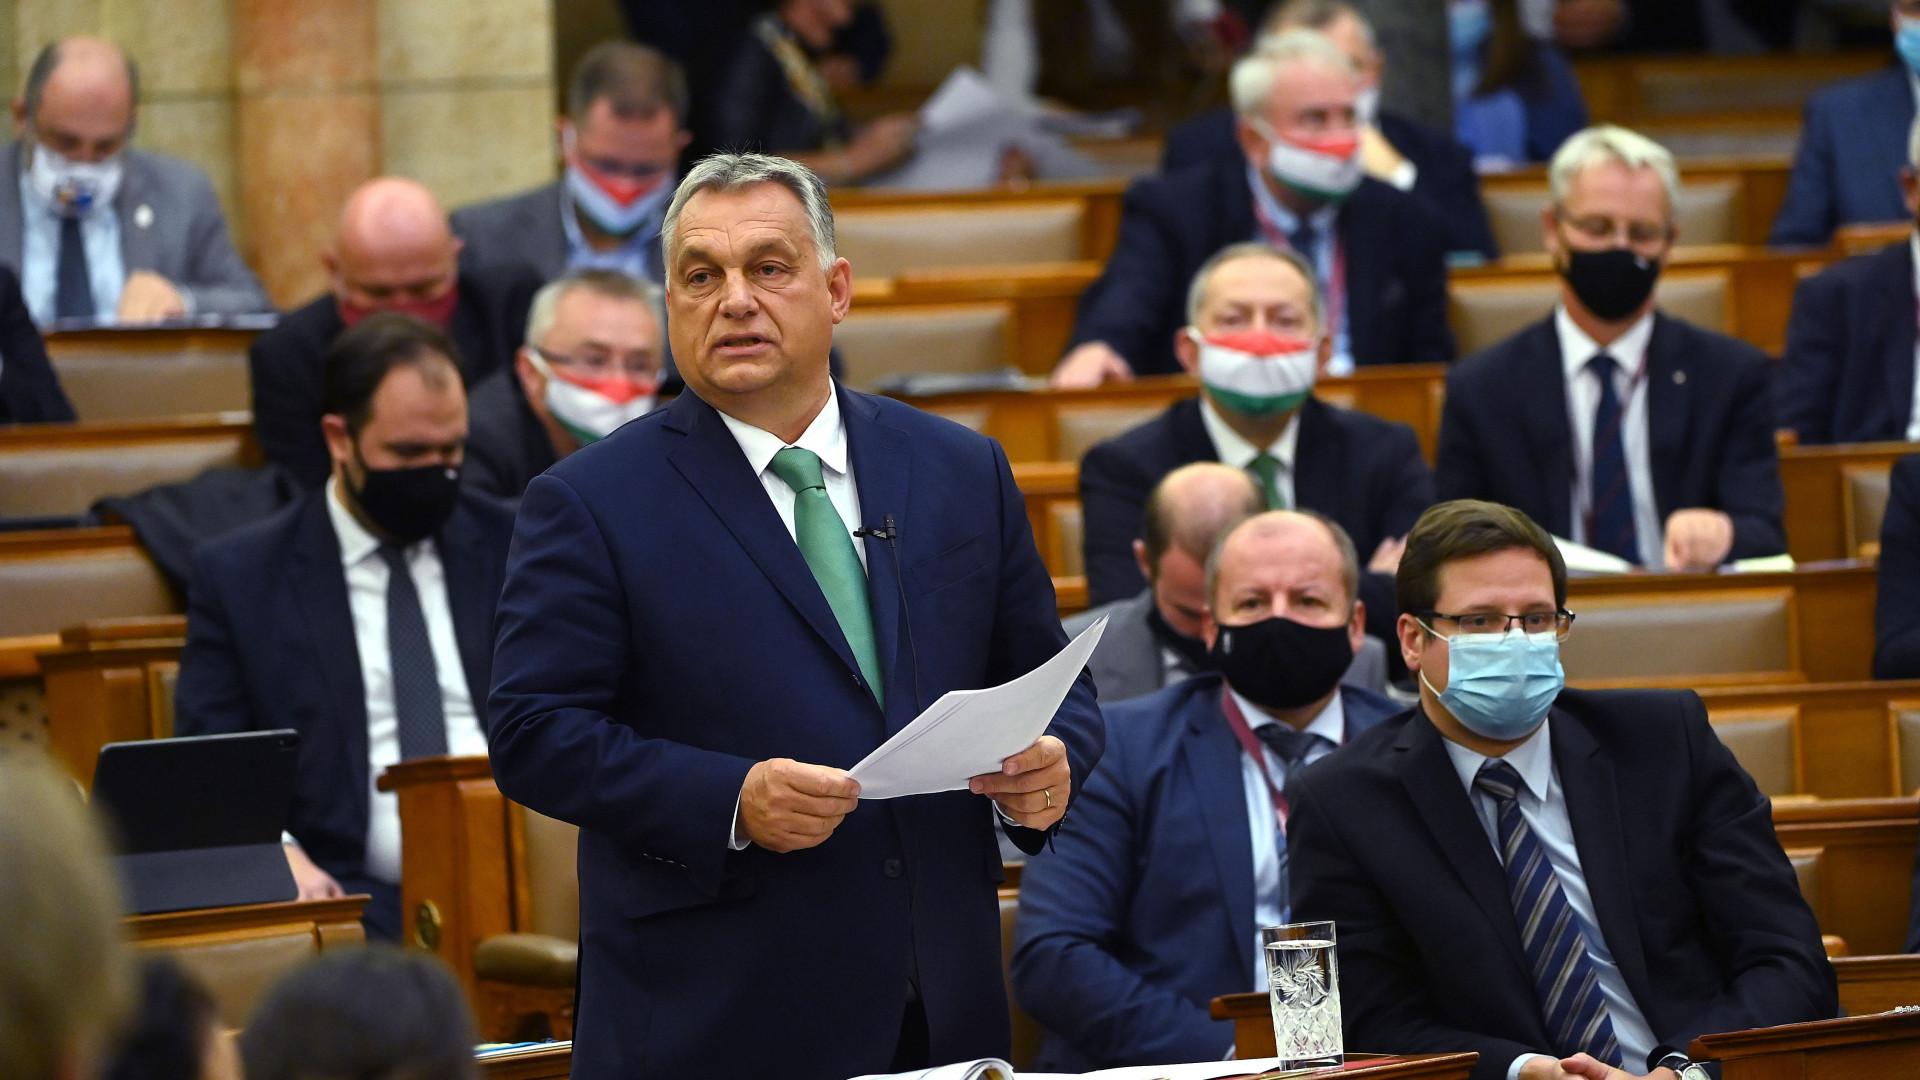 orban-viktor-parlament-406202.jpg